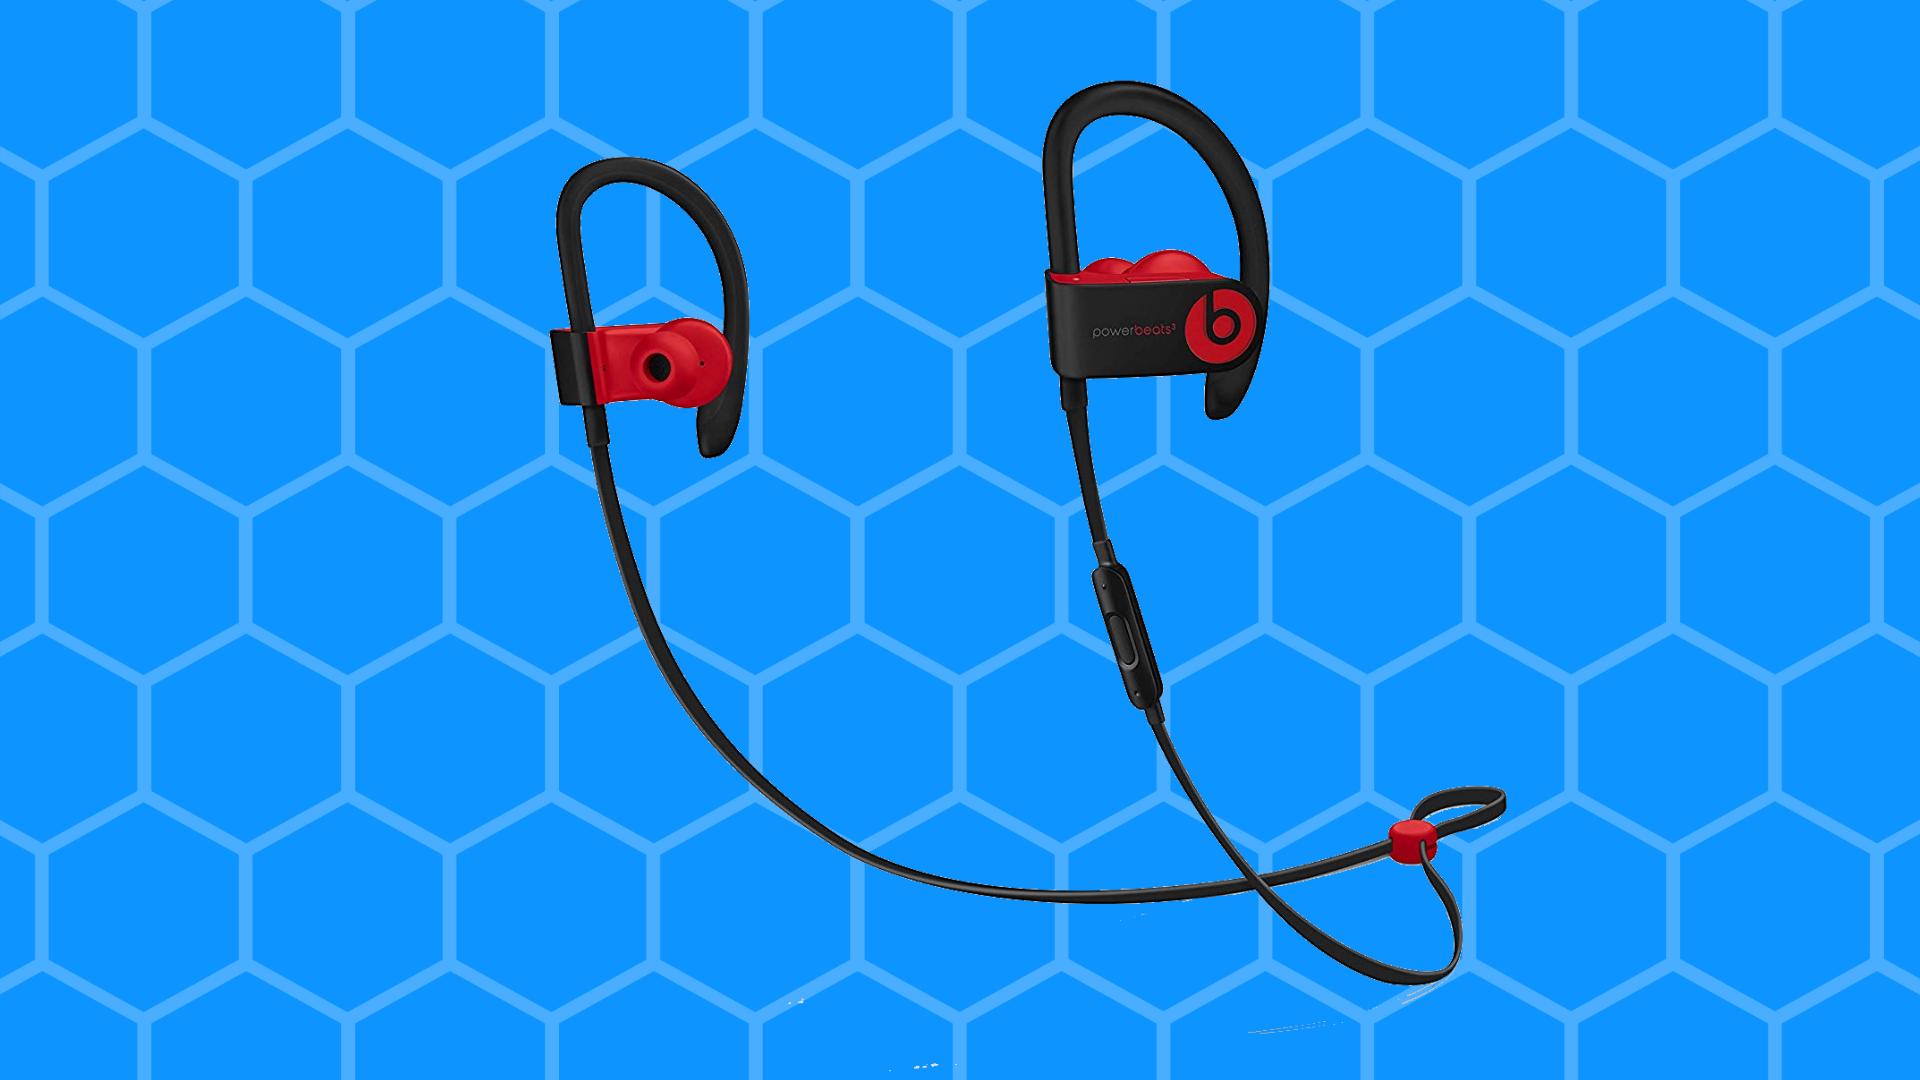 Snag the Beats Powerbeats 3 headphones on Amazon—for less than half price!